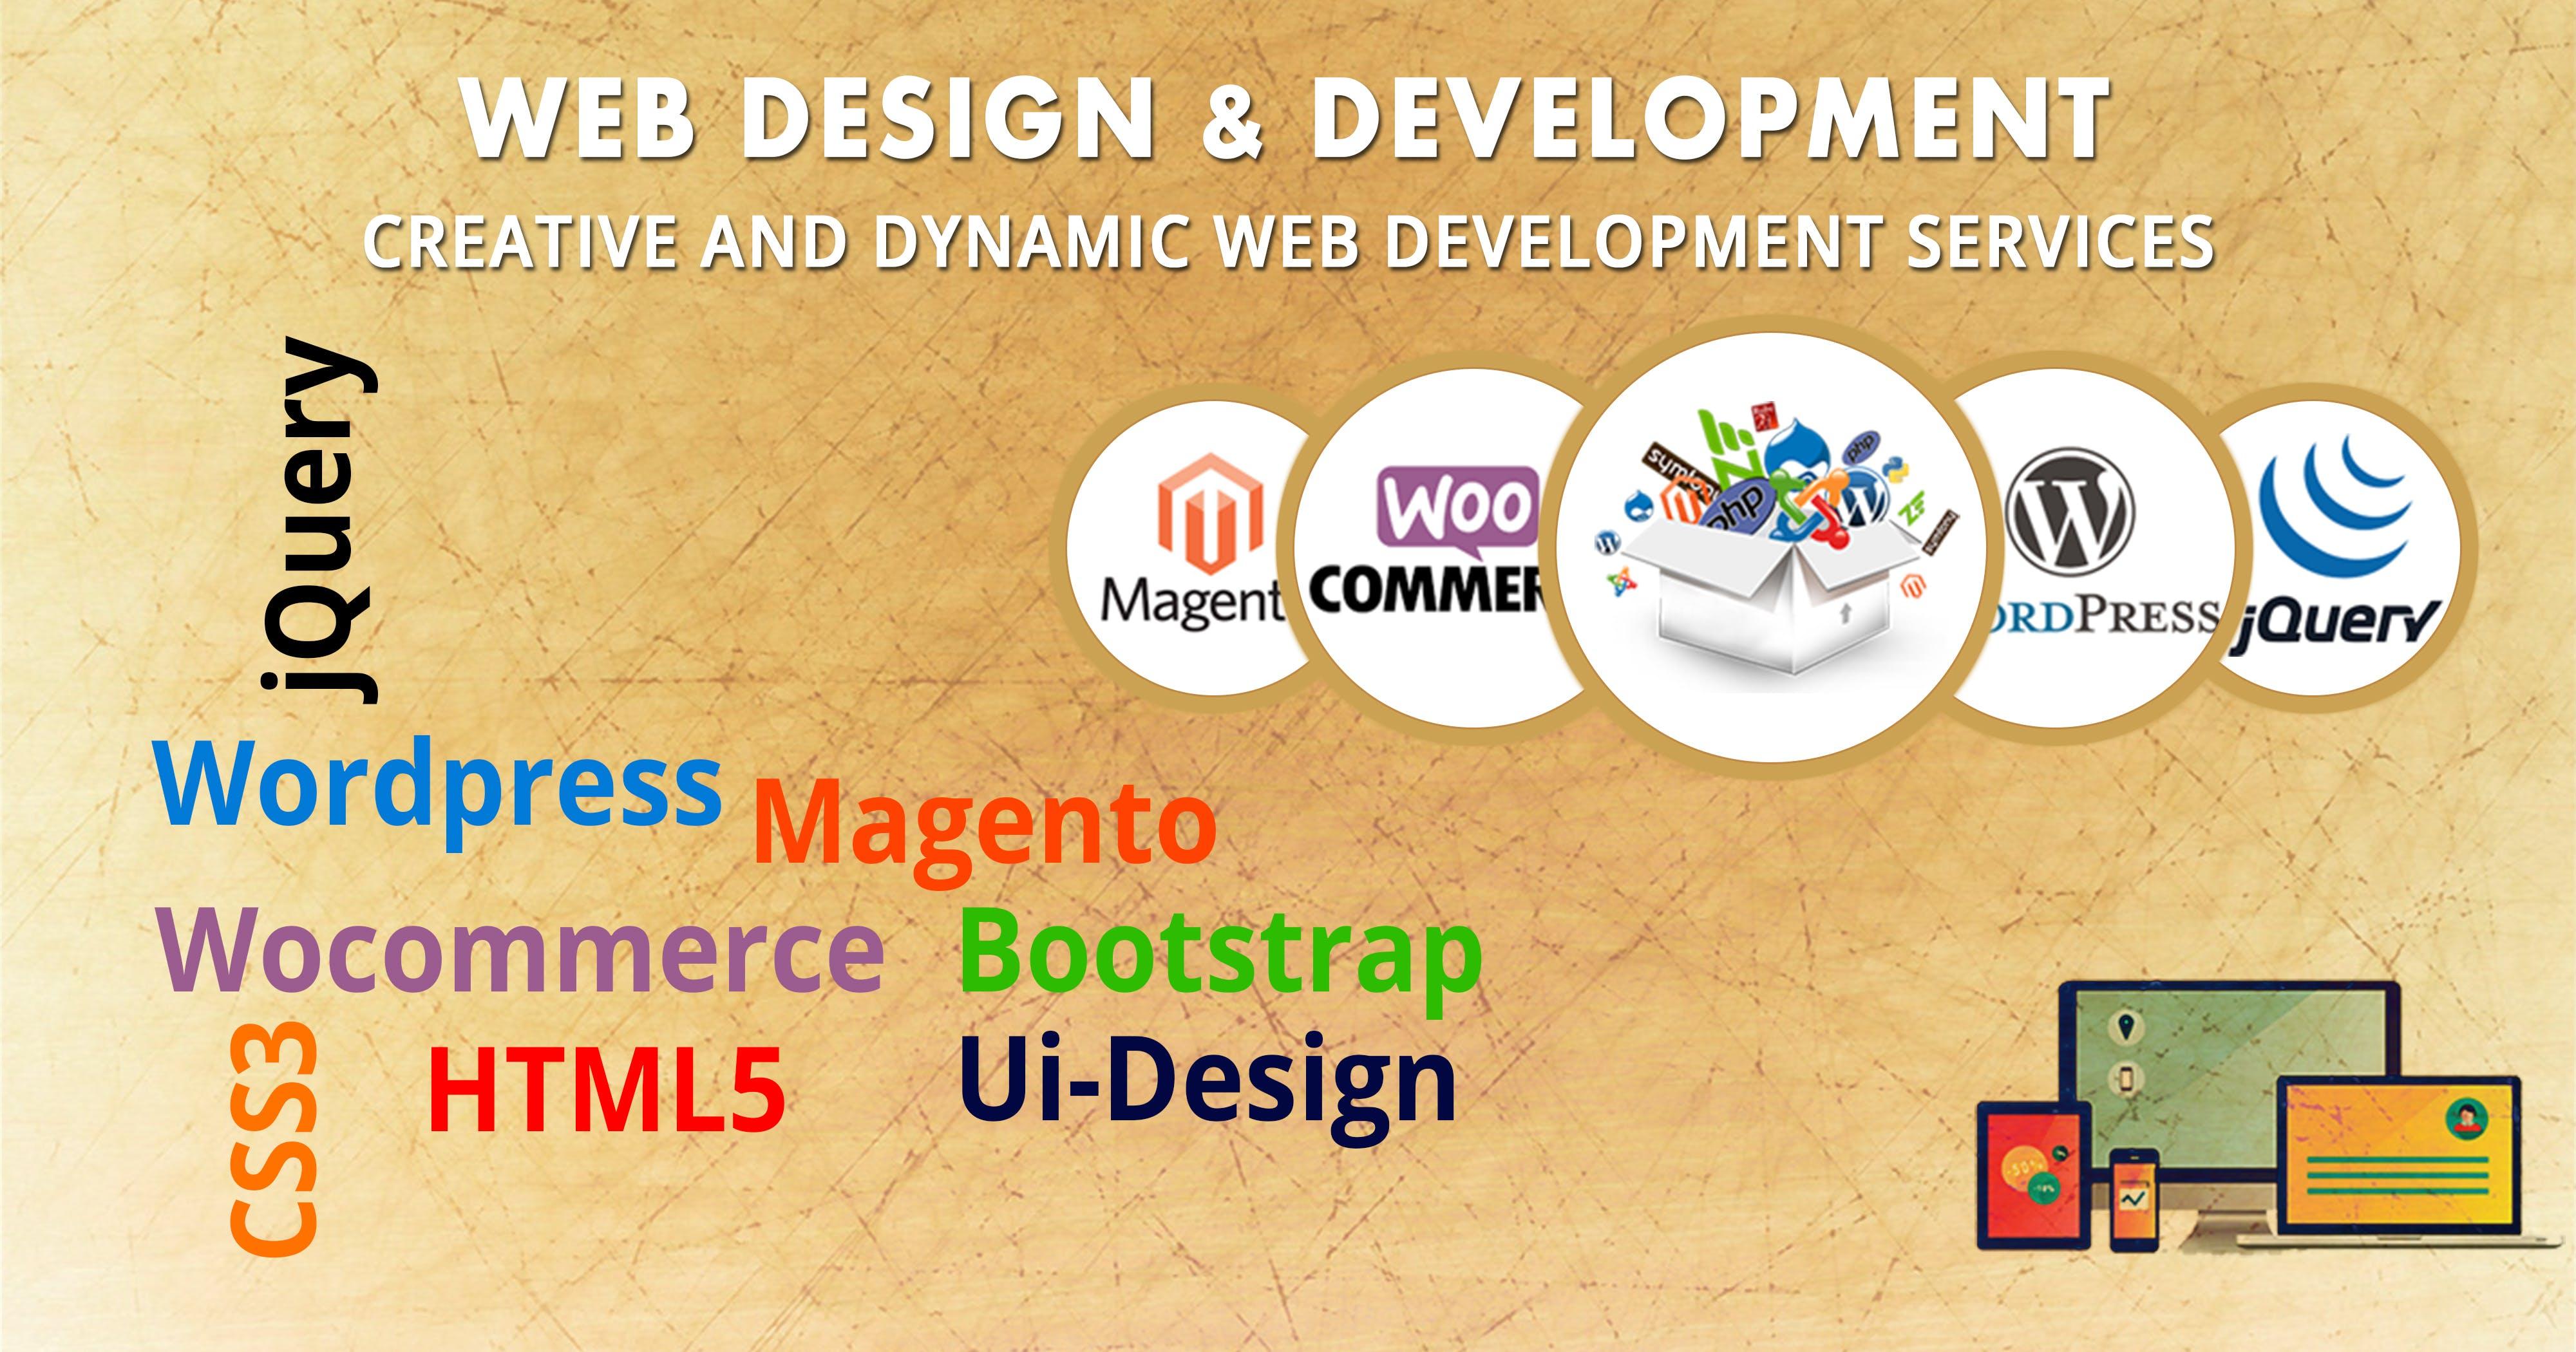 design, development, web design